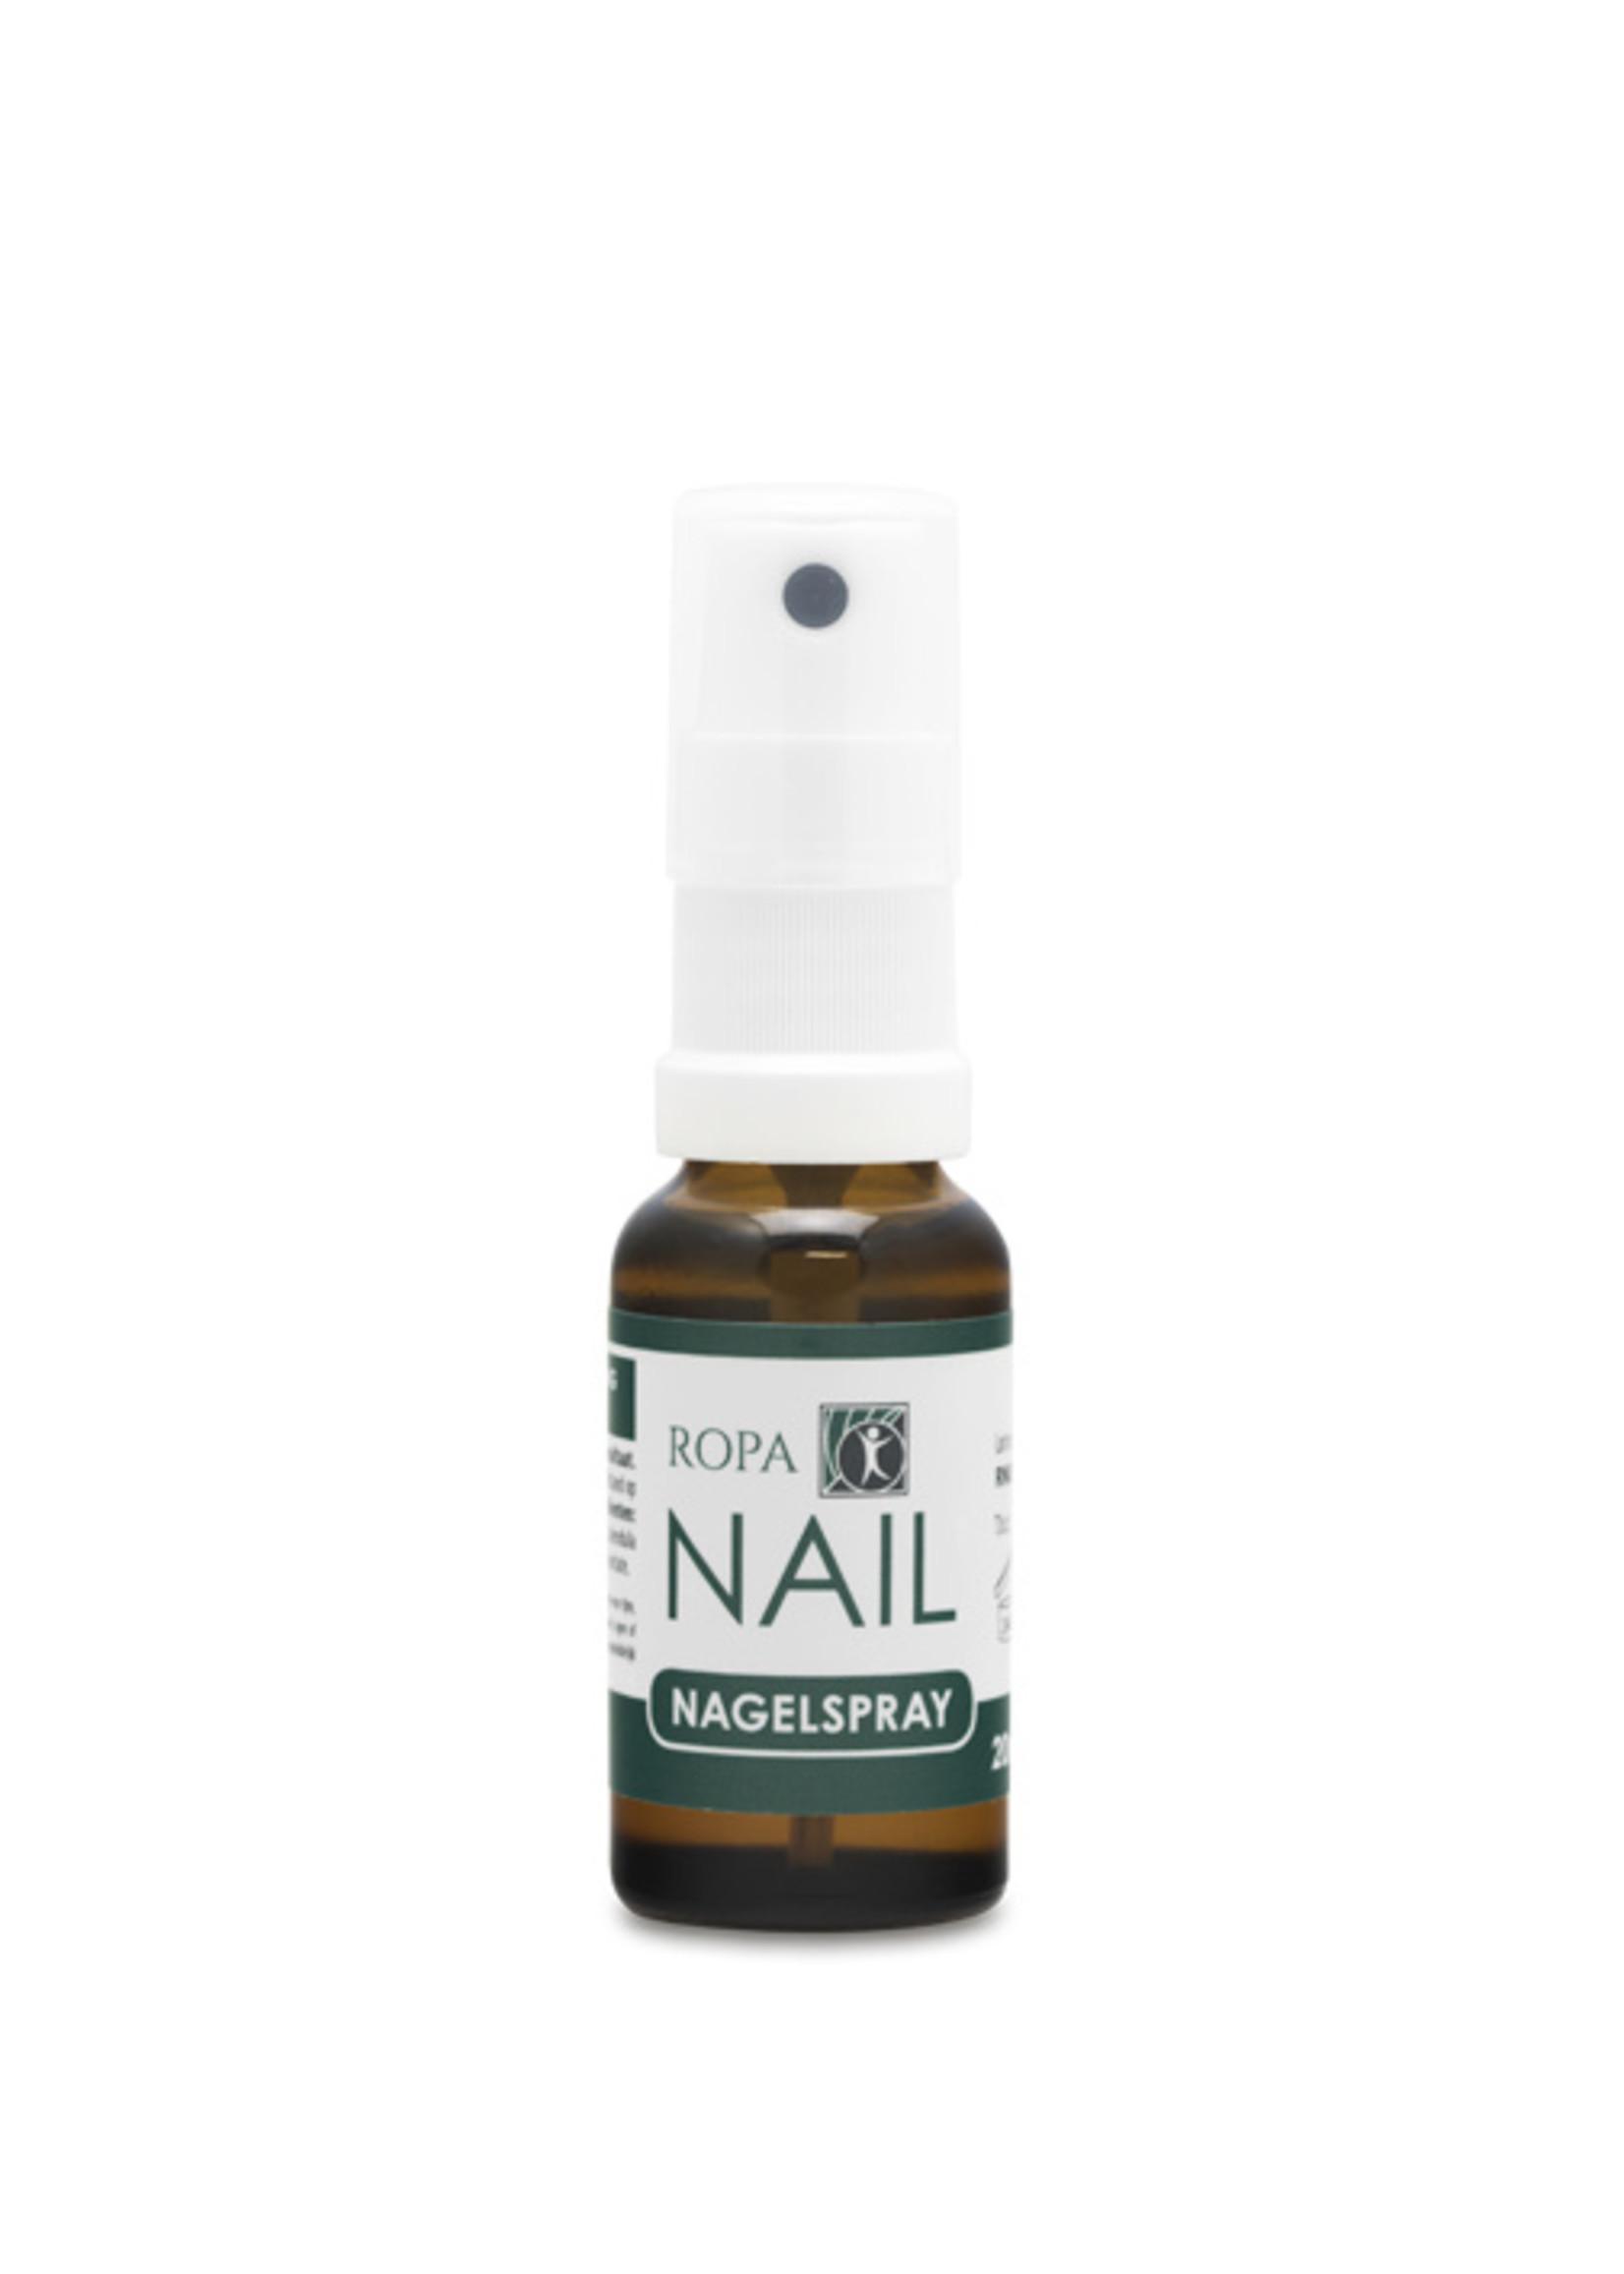 RopaNAIL - 100% Natuurlijke kalknagel spray - 20 ml